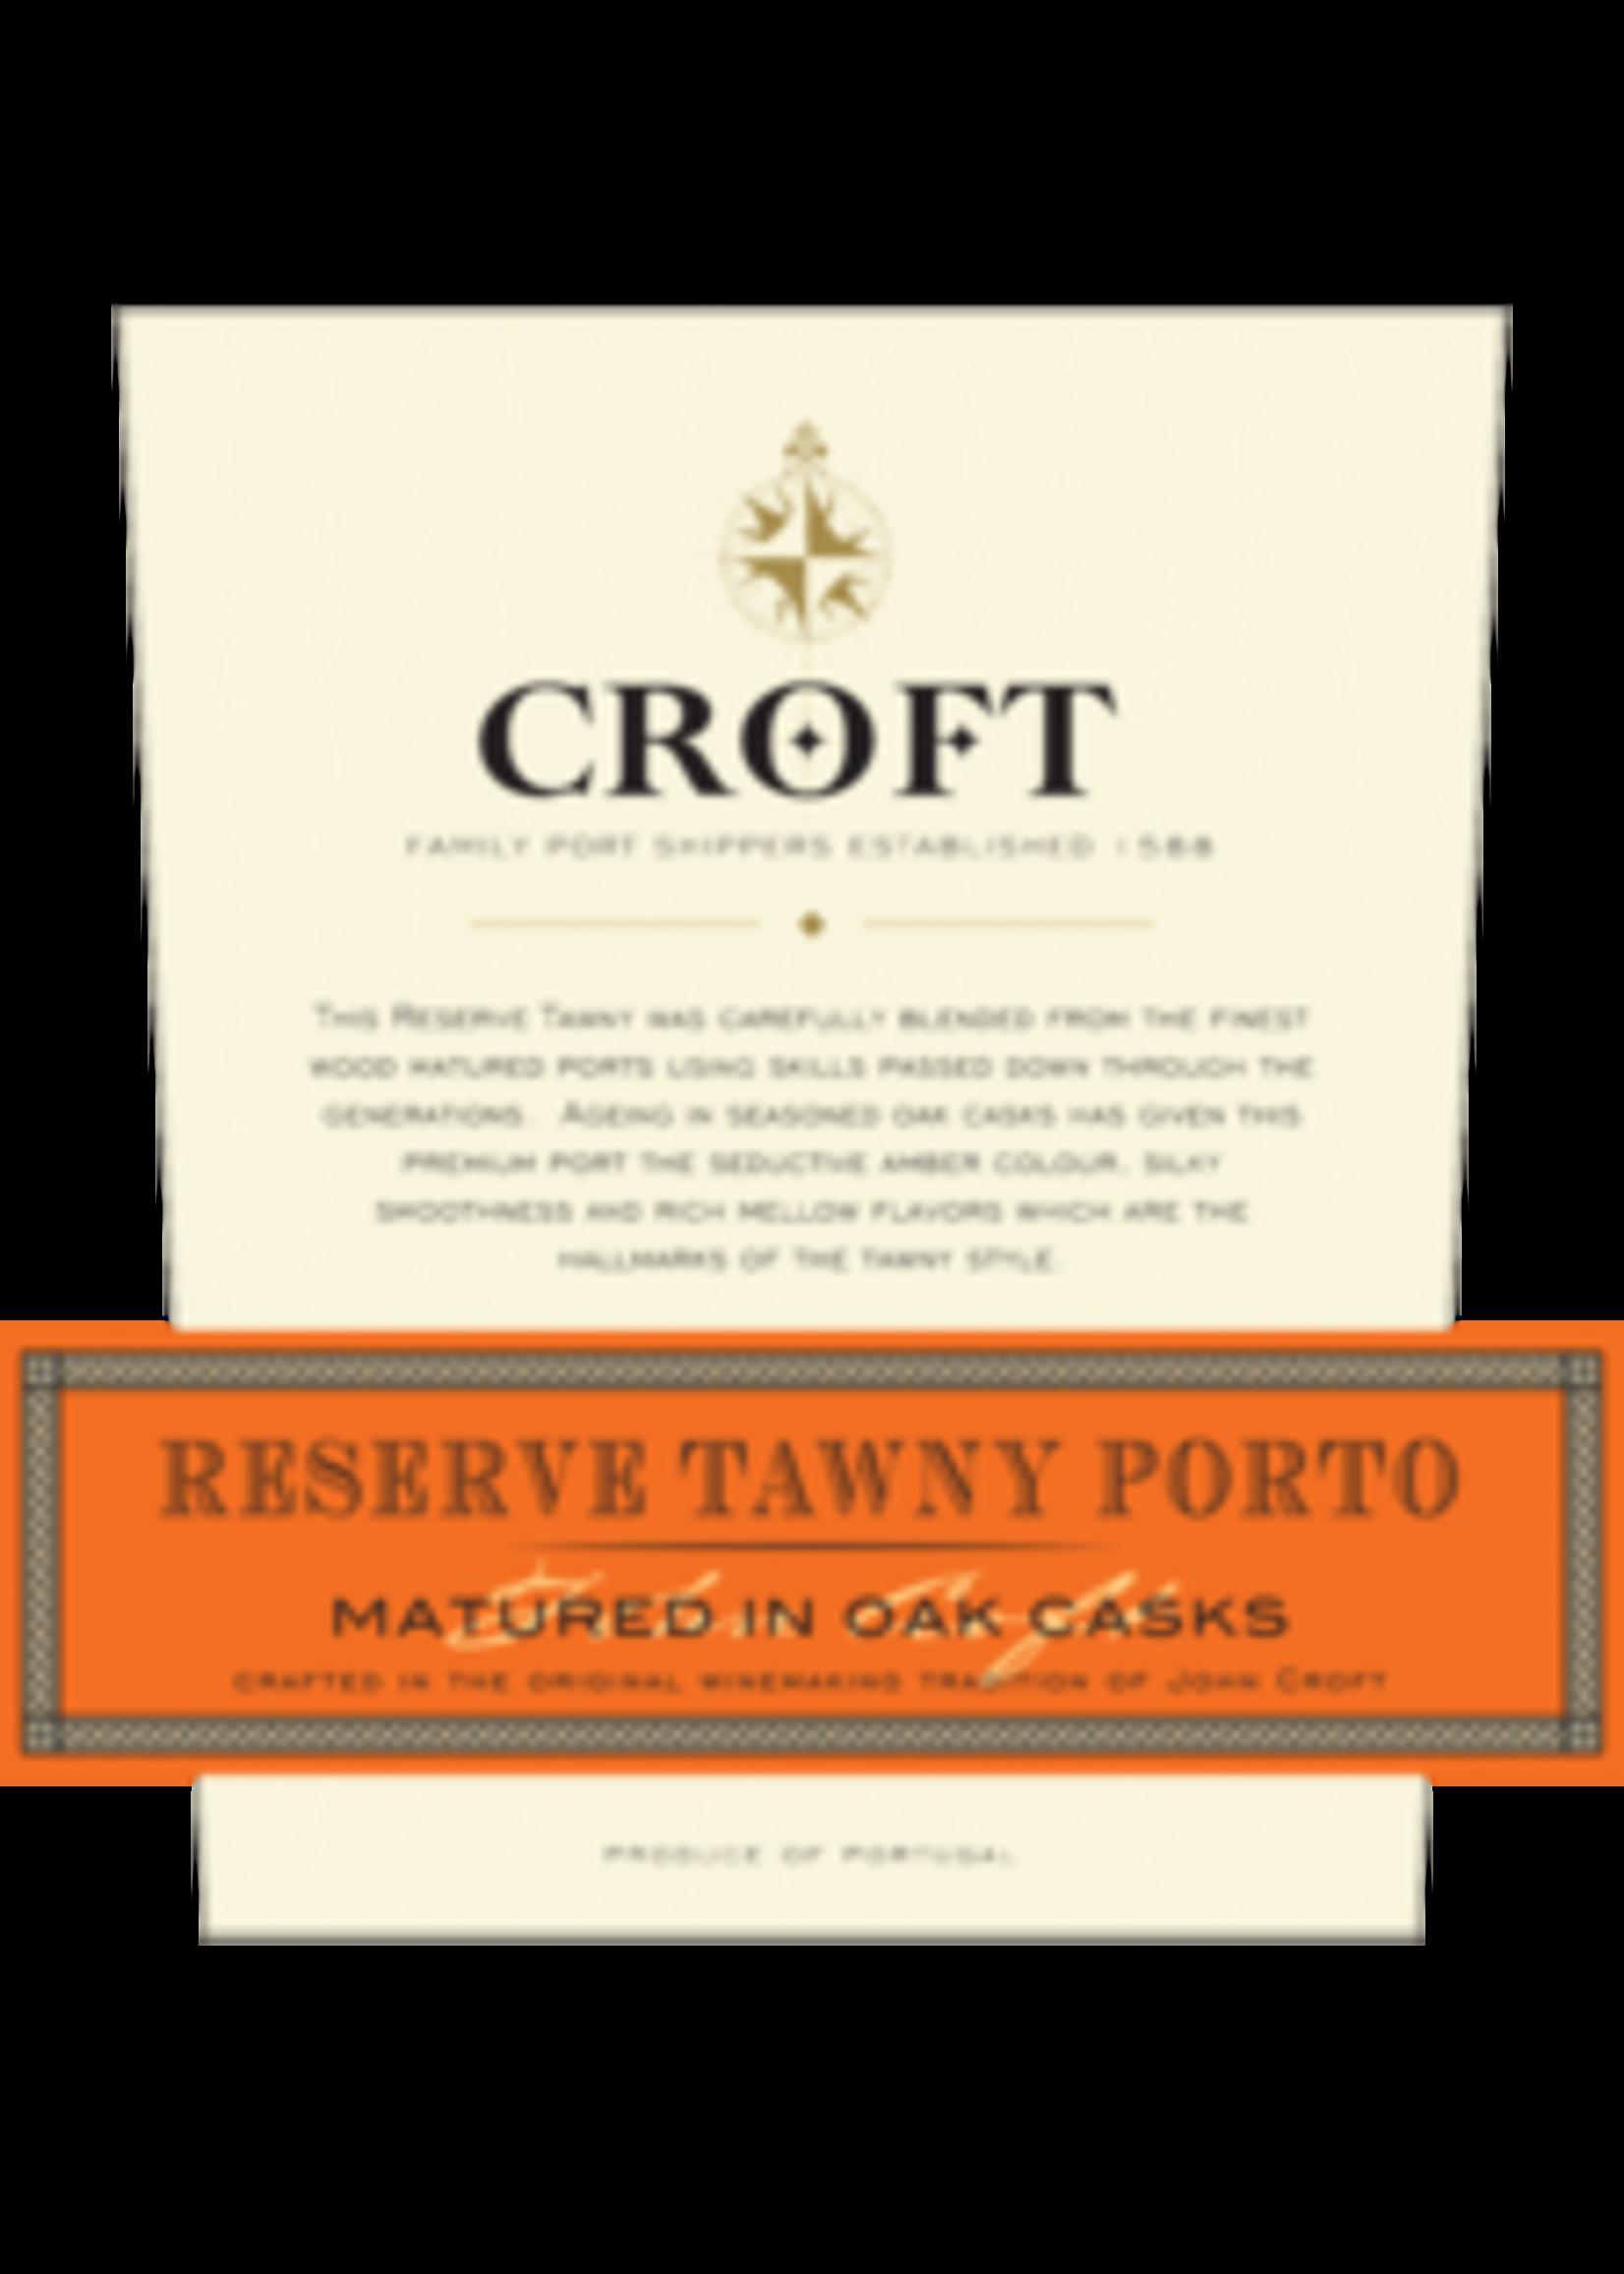 Croft Port Croft Port / Reserve Tawny Porto / 750mL